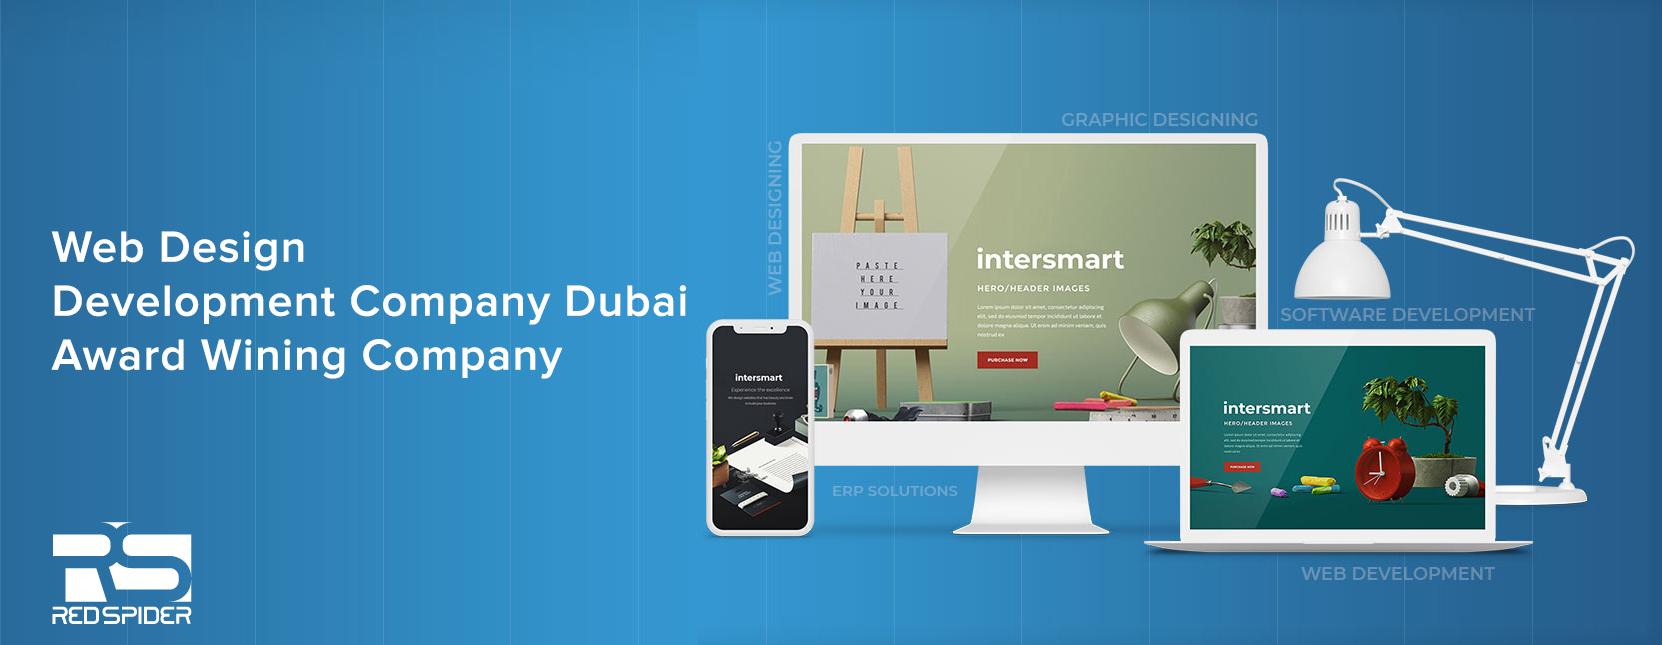 Web-Design-Development-Company-Dubai-Award-Wining-Company